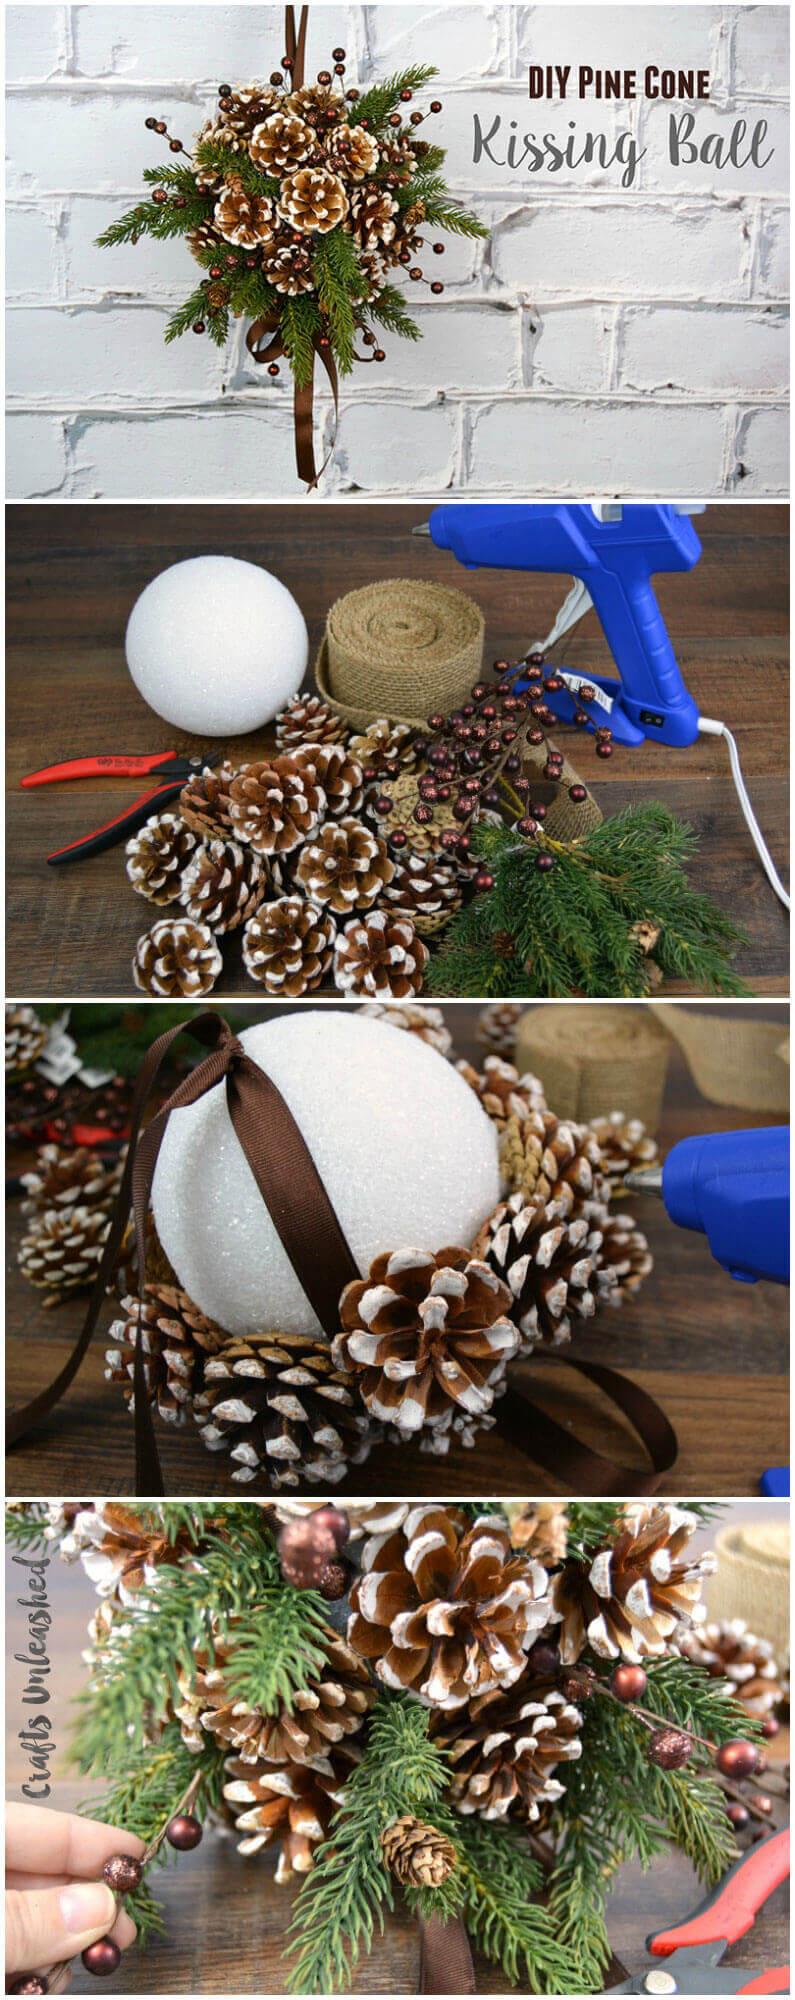 21 Best DIY Pine Cone Craft Ideas - Homemade Christmas ...